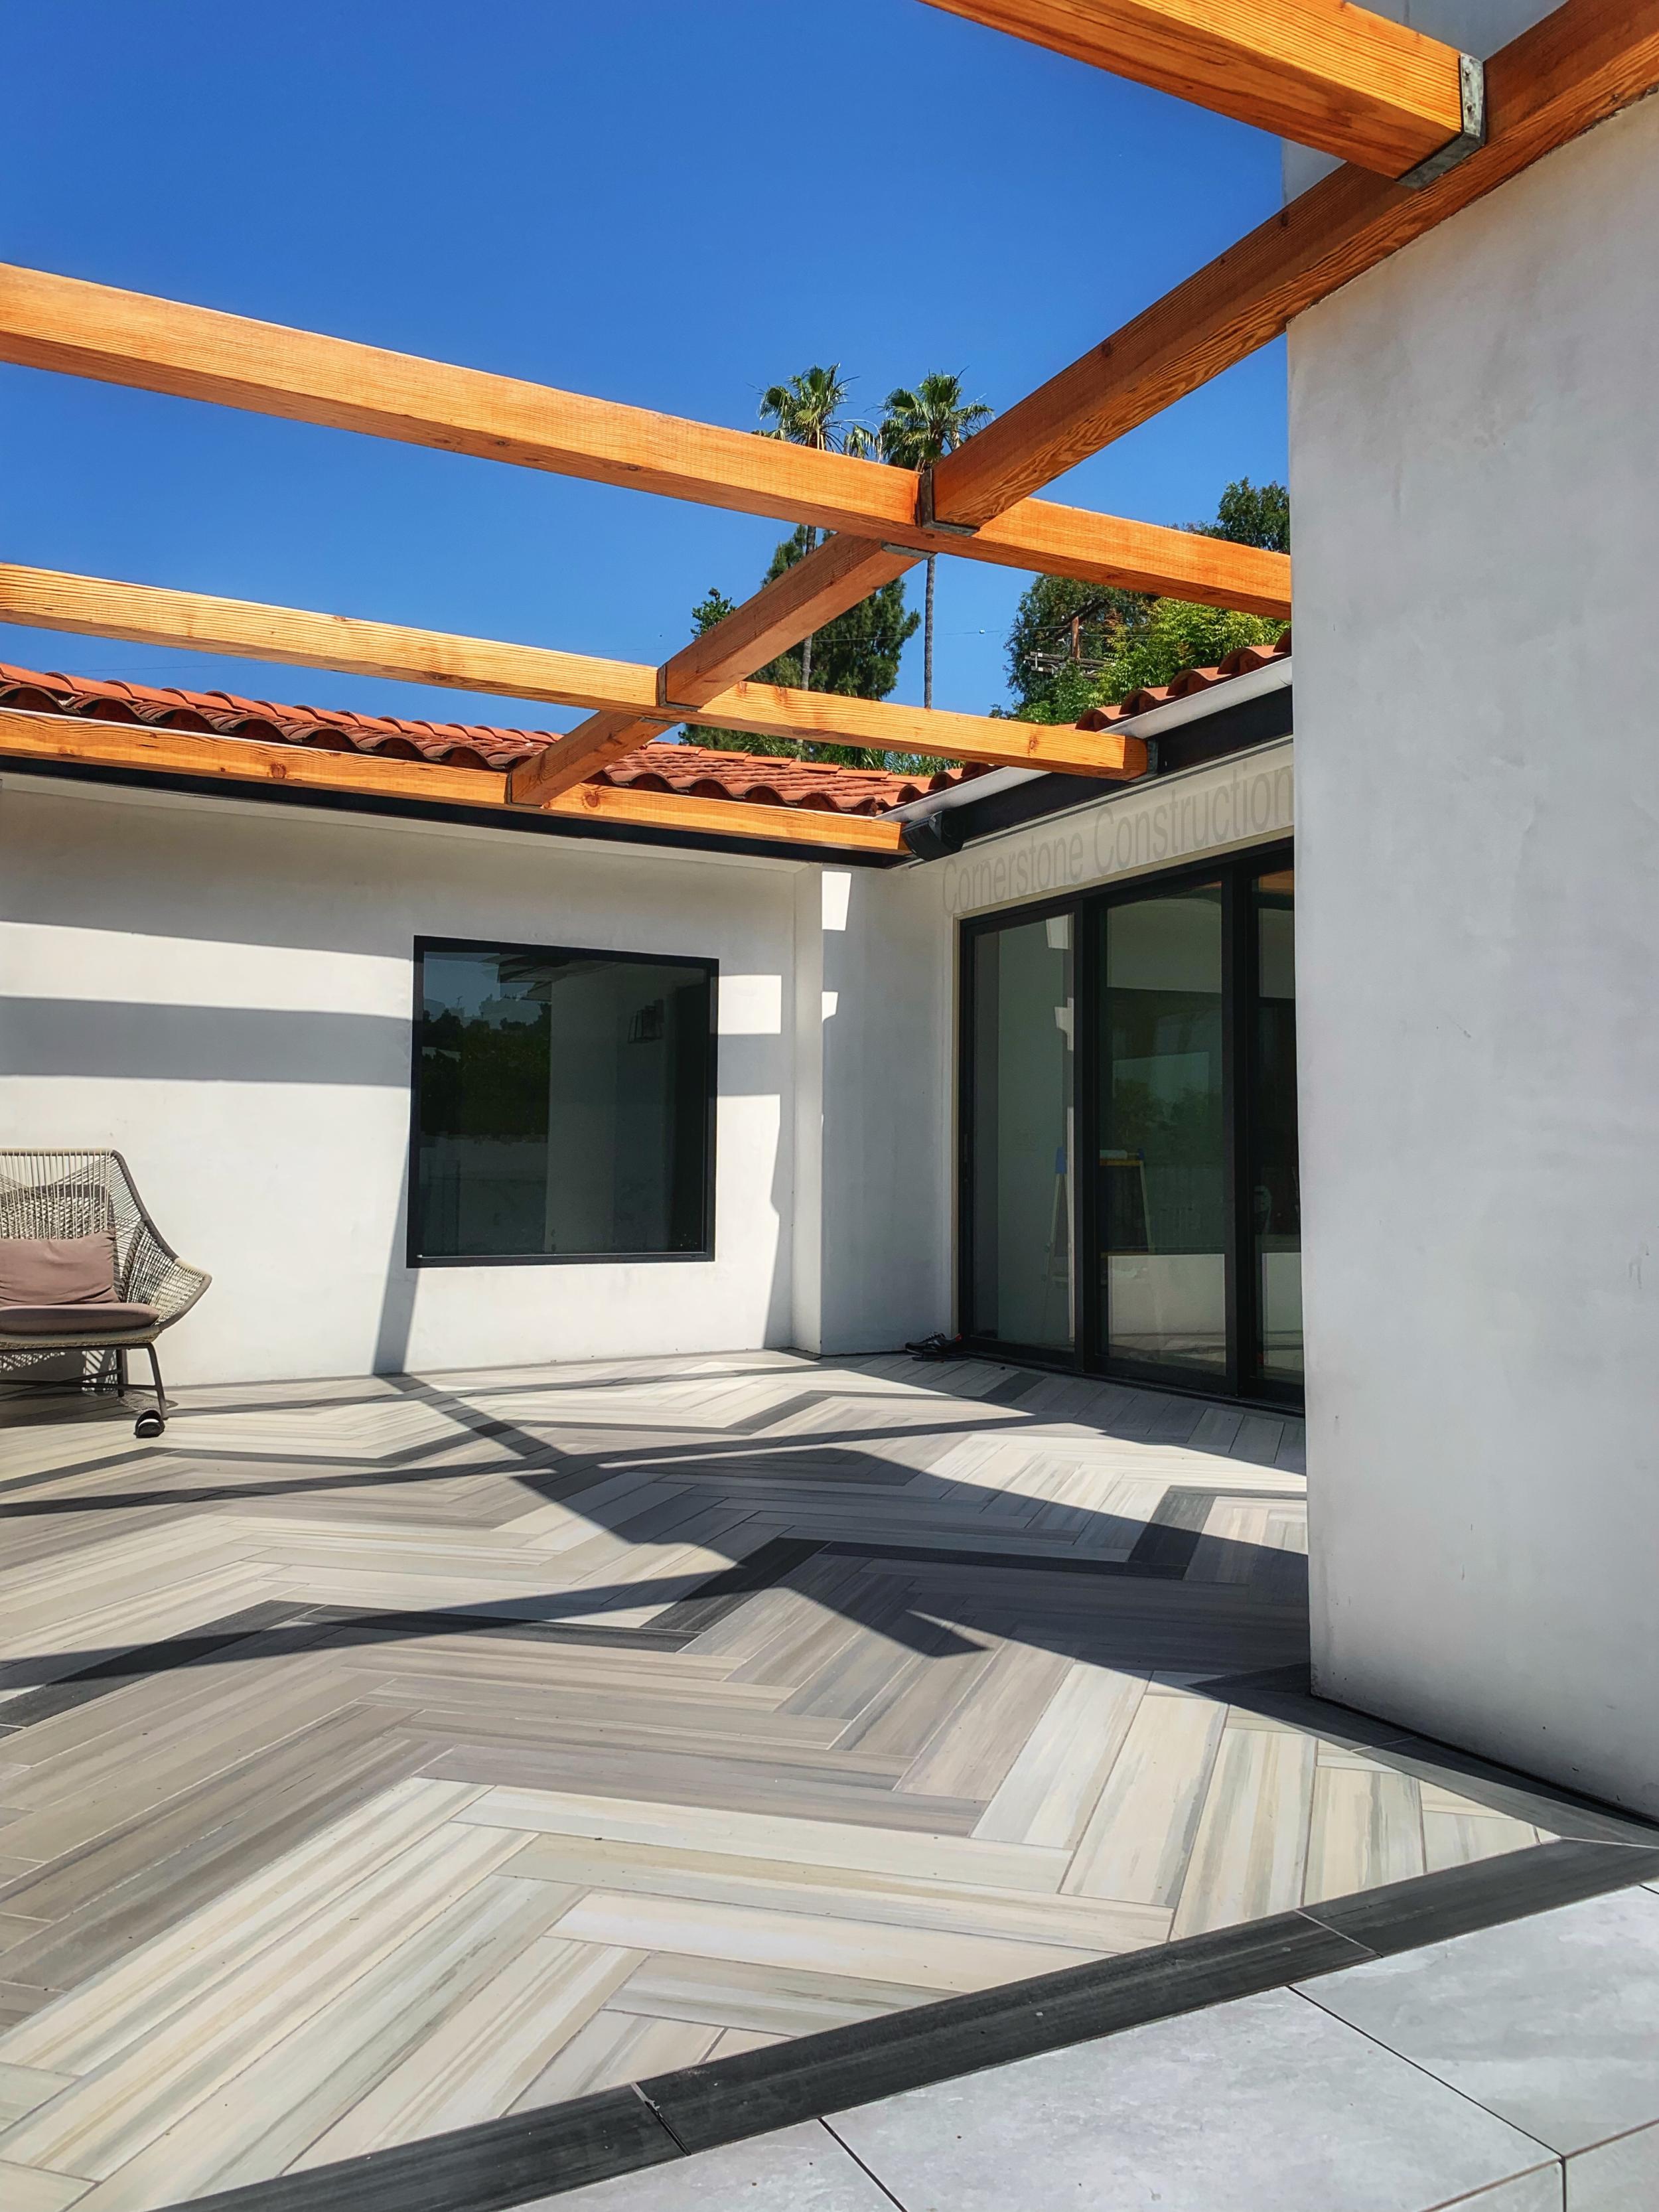 gradient herringbone tile in patio